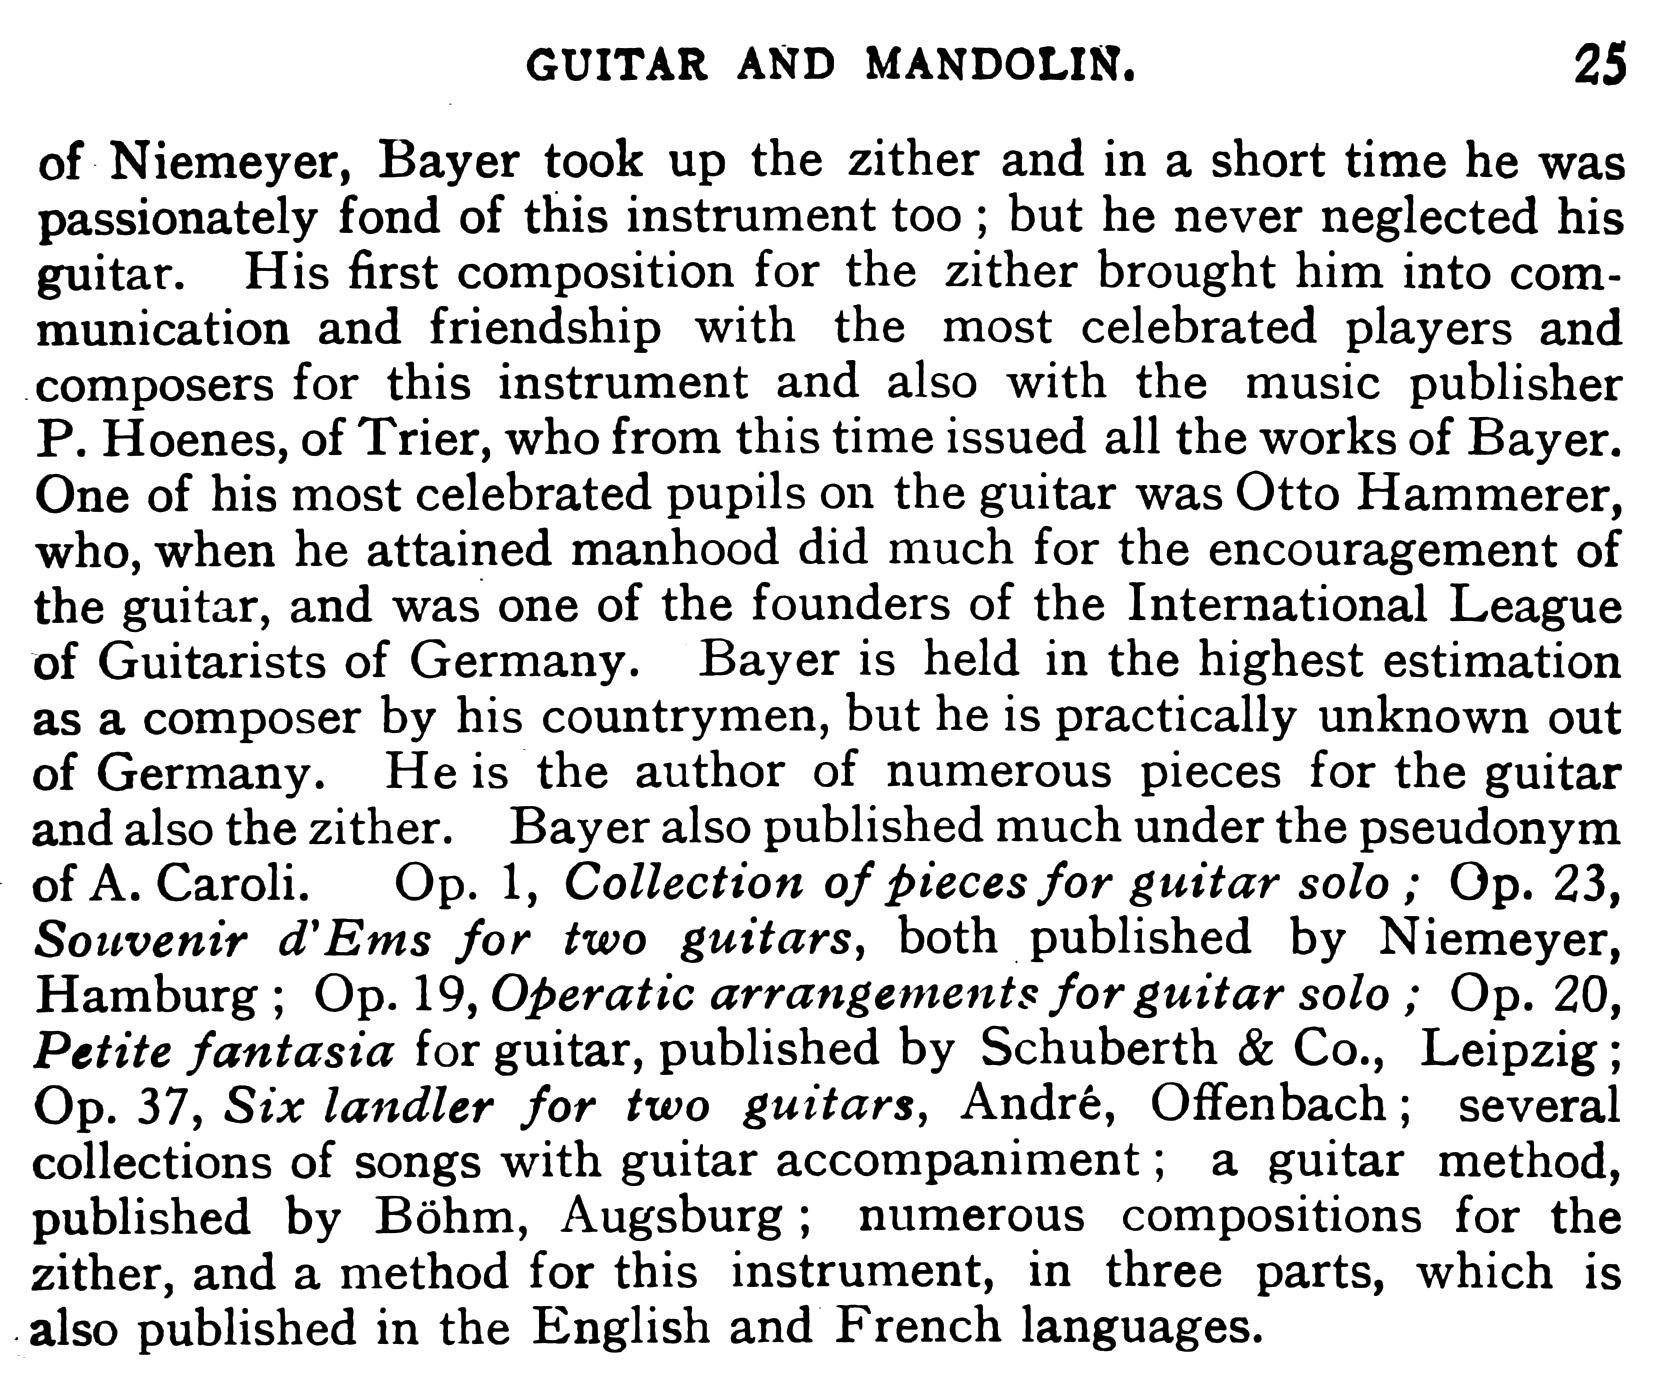 Biography of Eduard Bayer - Part 4